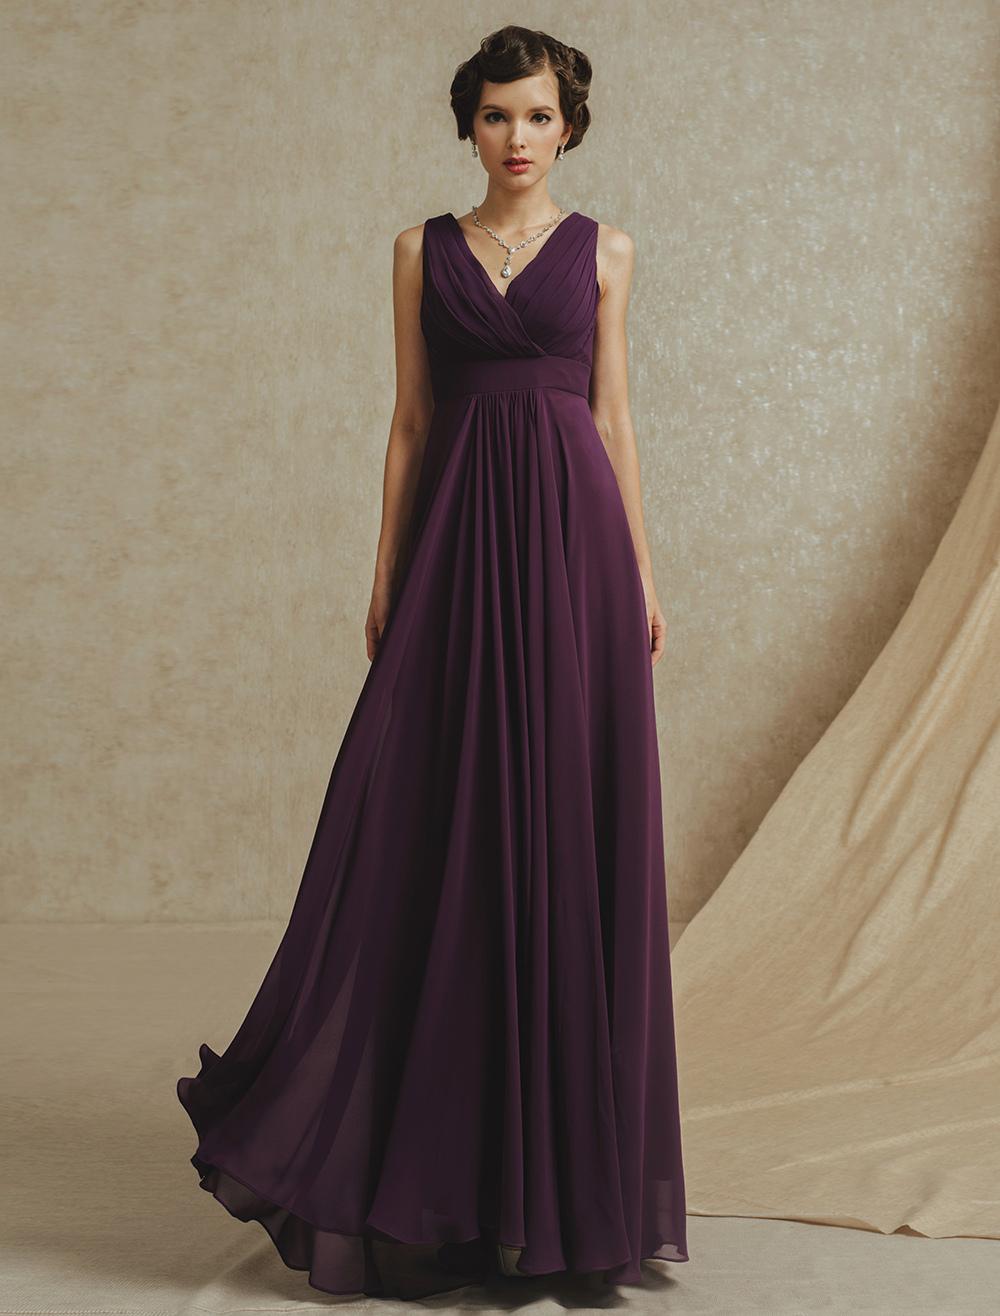 79c72fab4605 ... Deep Purple Pleated Chiffon Bridesmaid Dress with V-Neck-No.8. 12.  35%OFF. Color:Plum